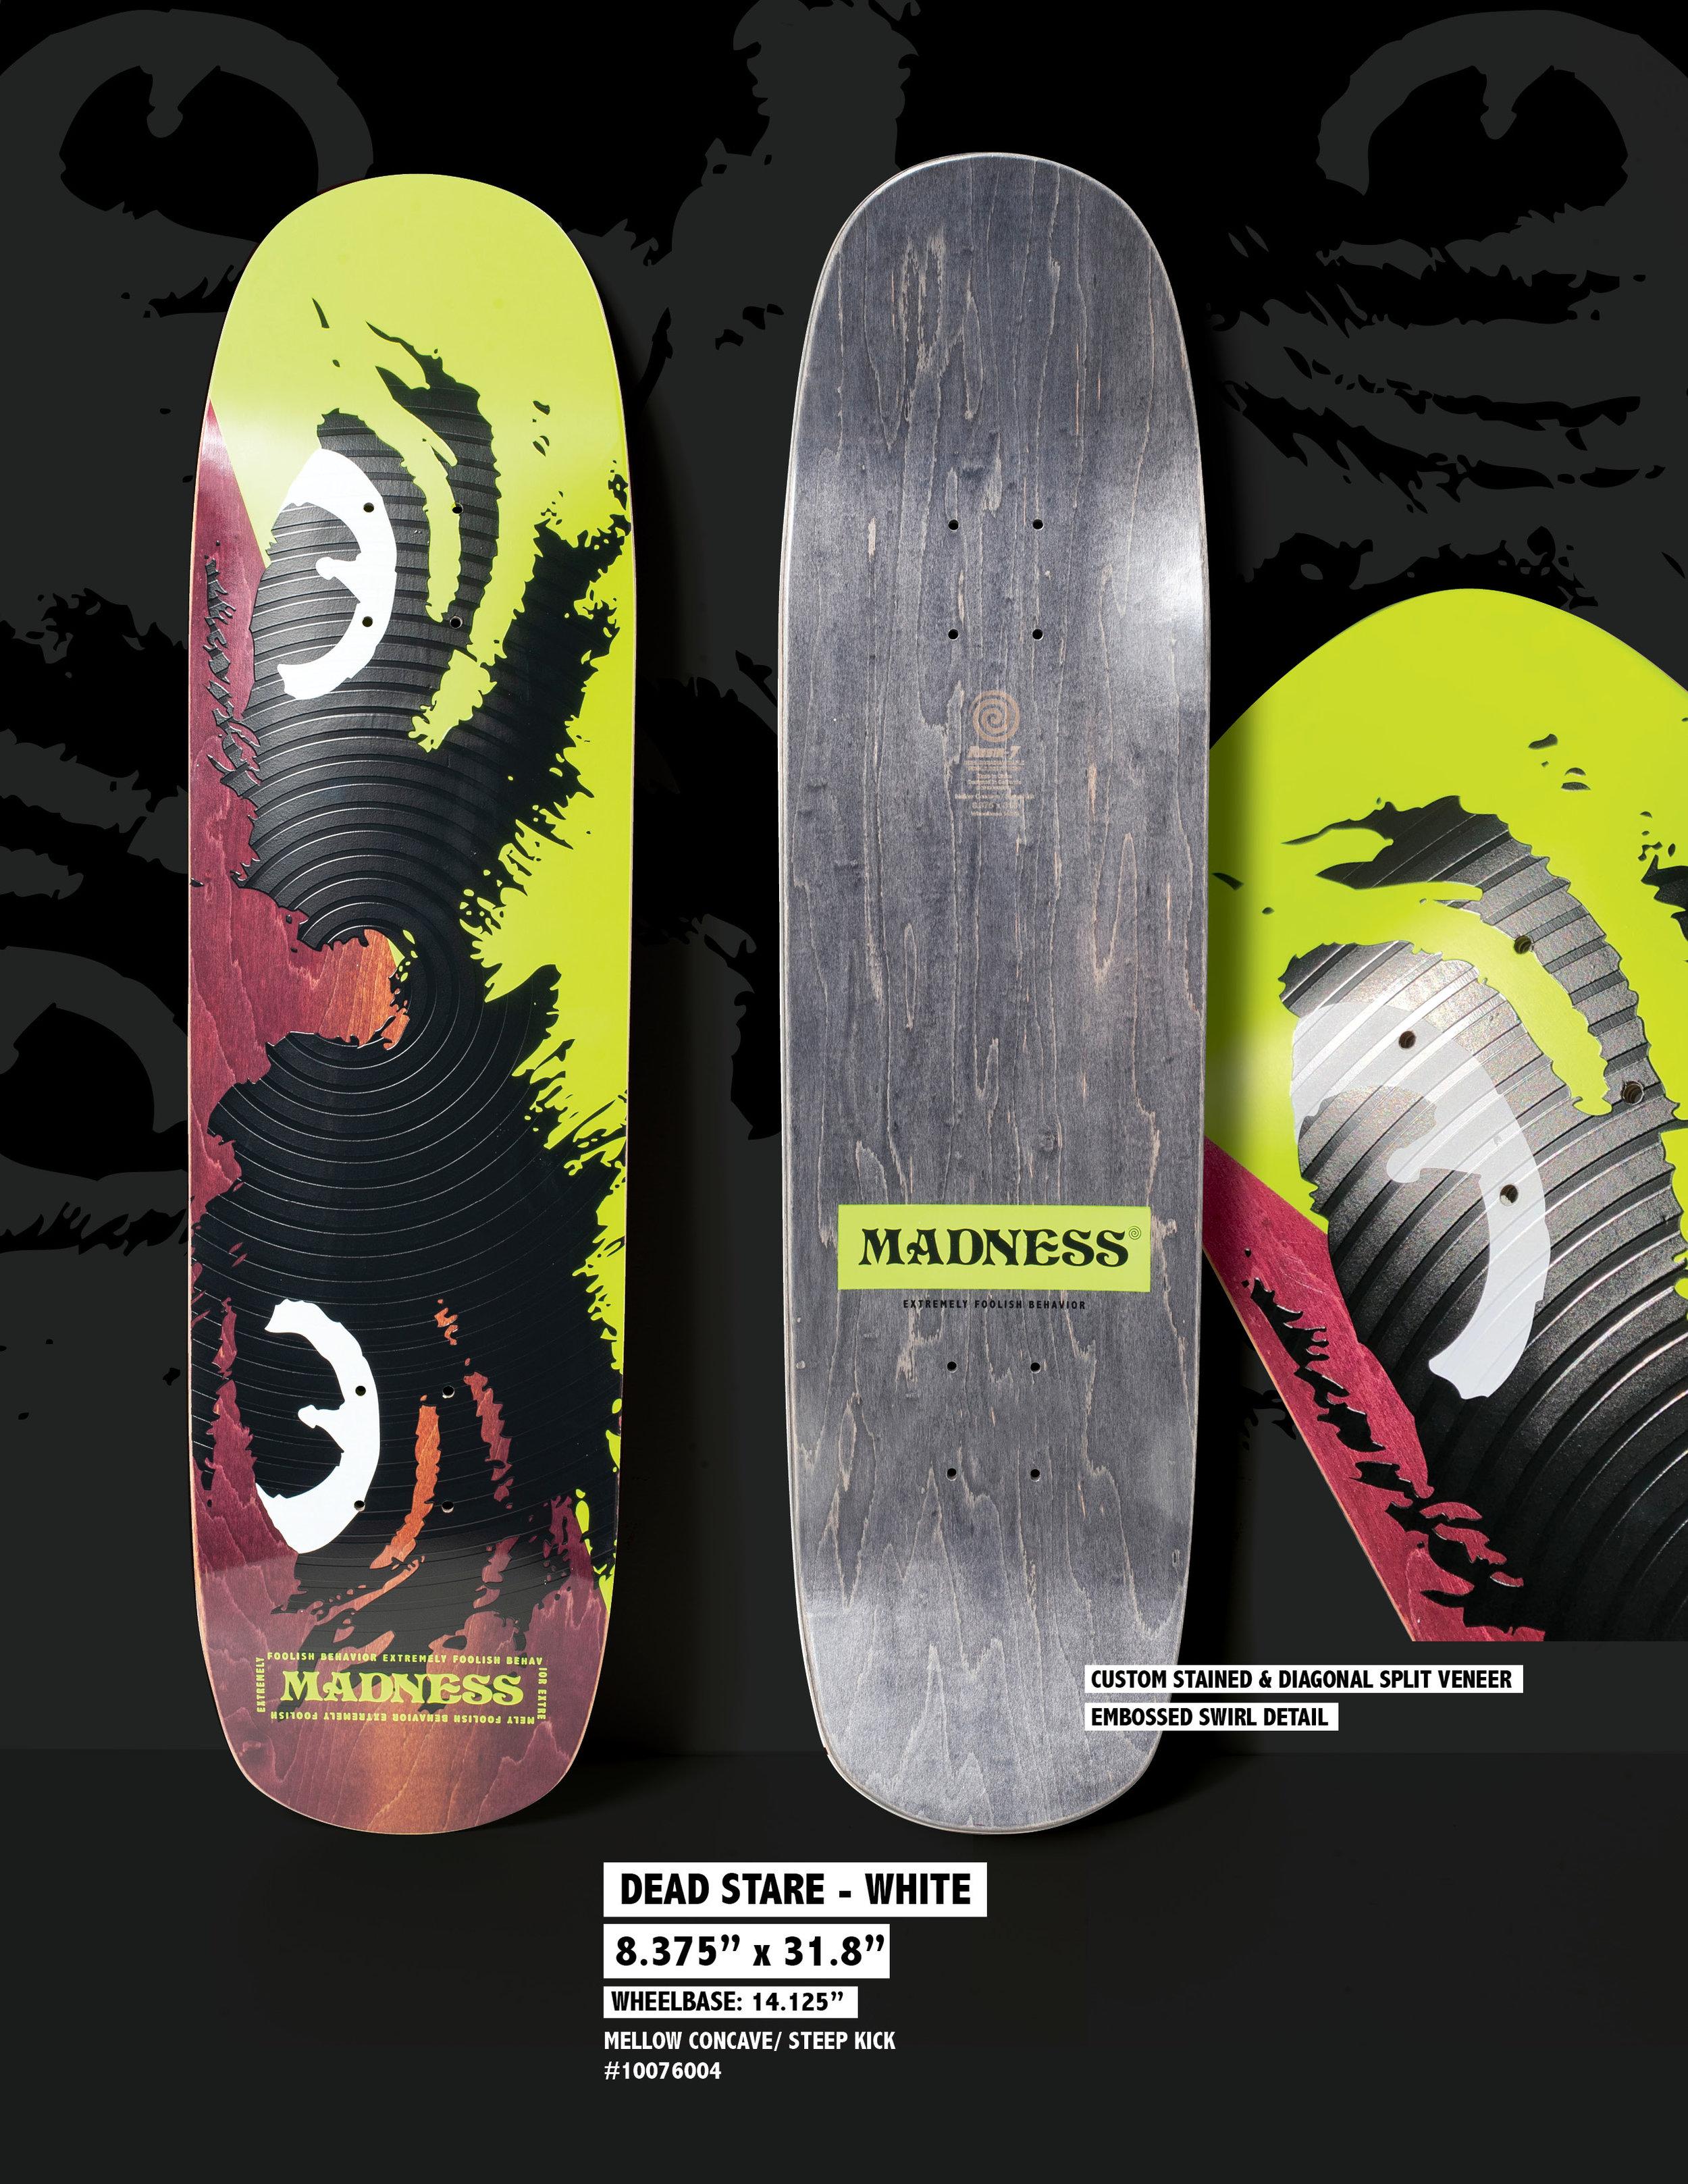 Madness_Spring_1915_Dead_Stare__Skateboard_Deck.jpg